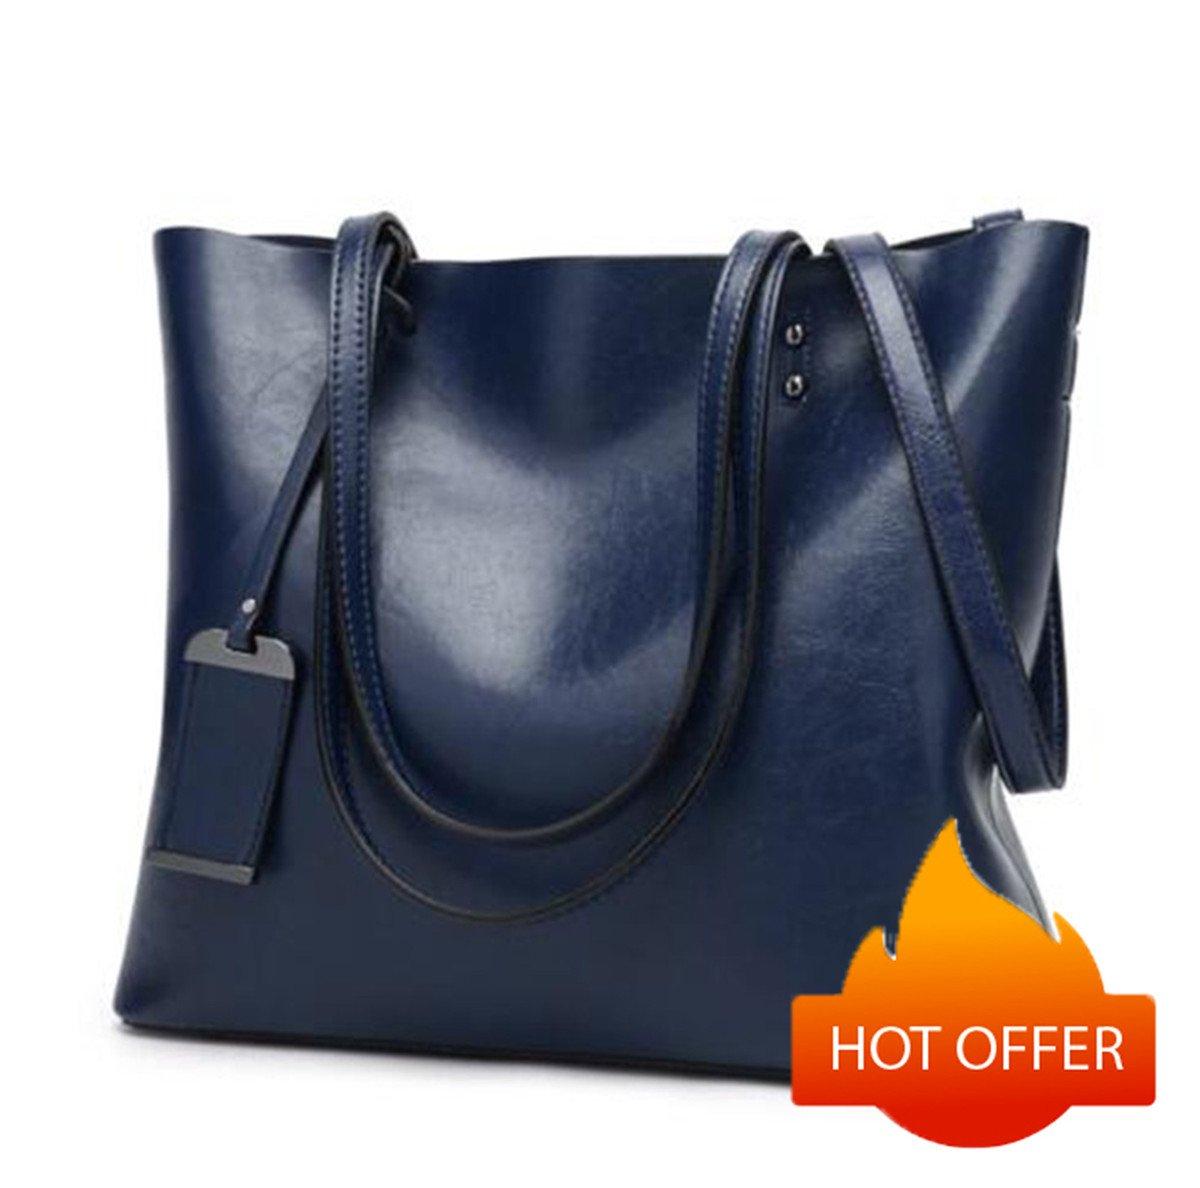 Women Shoulder Bags Zipper Handbags for Women Top Handle Bag Tote Bags by YUNS (Dark Blue)